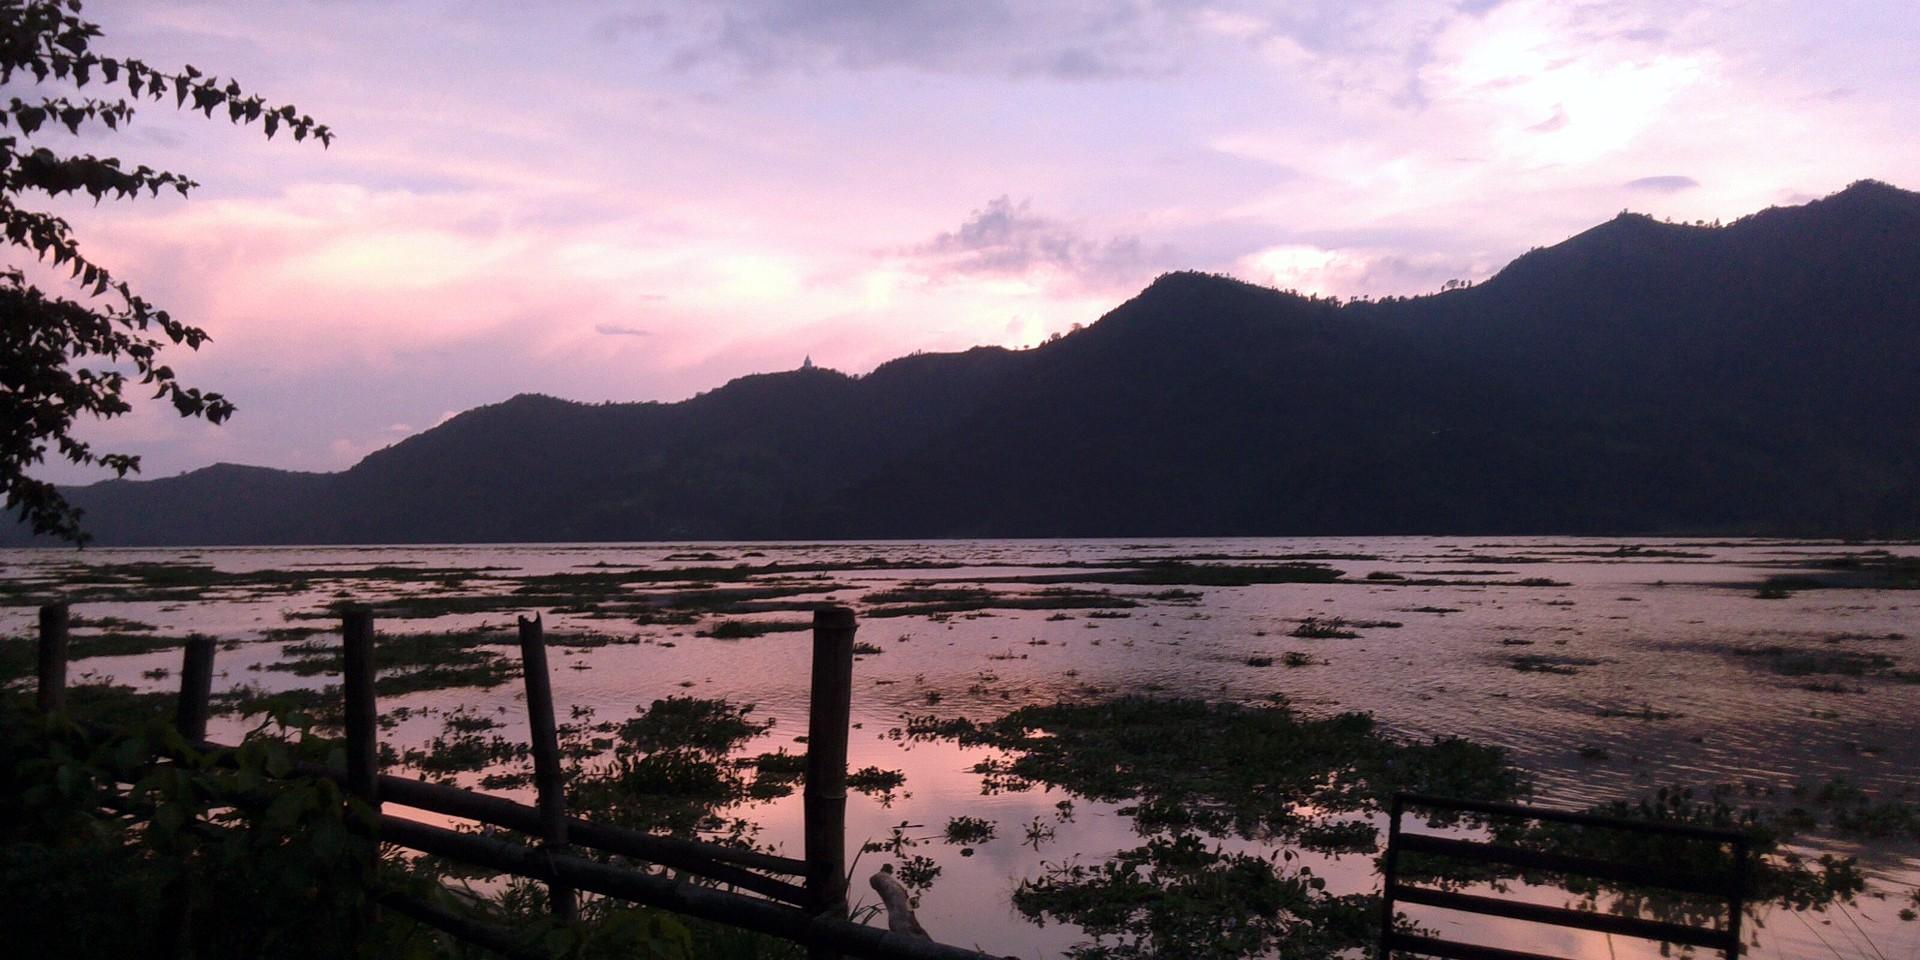 phewa-lake-dusk-1920x1080